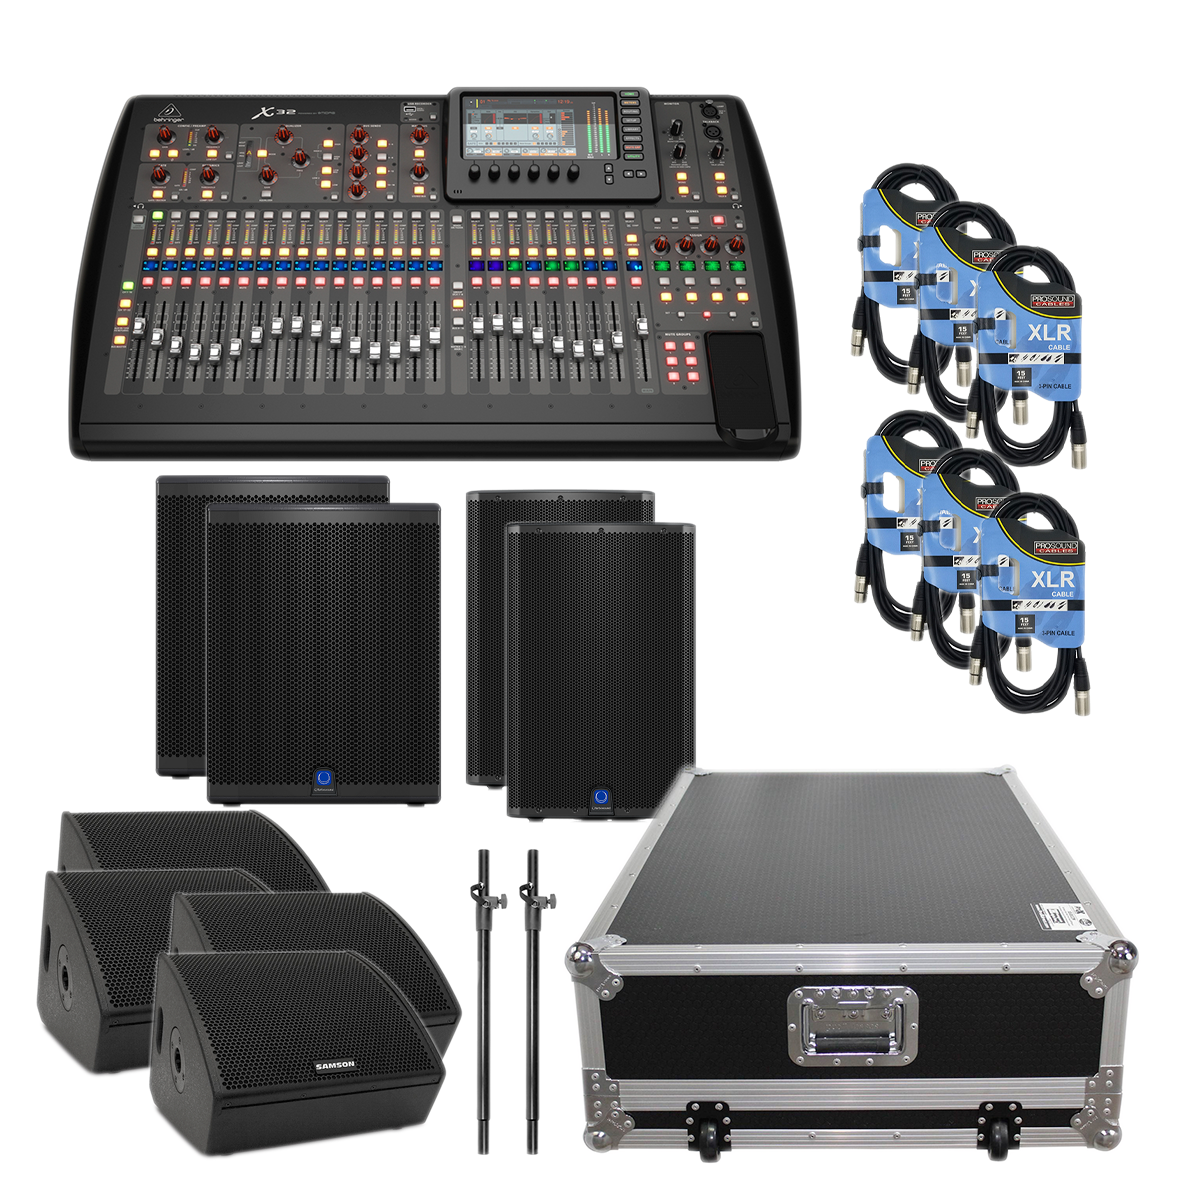 -7 Behringer X32 40-Channel - (4) Samson RSXM12A - (2) TurboSound IQ15 - (2) TurboSound IQ18B - XS-BX32W - (2) Speaker Poles - (6) XLR50FT Cables - $6999.99